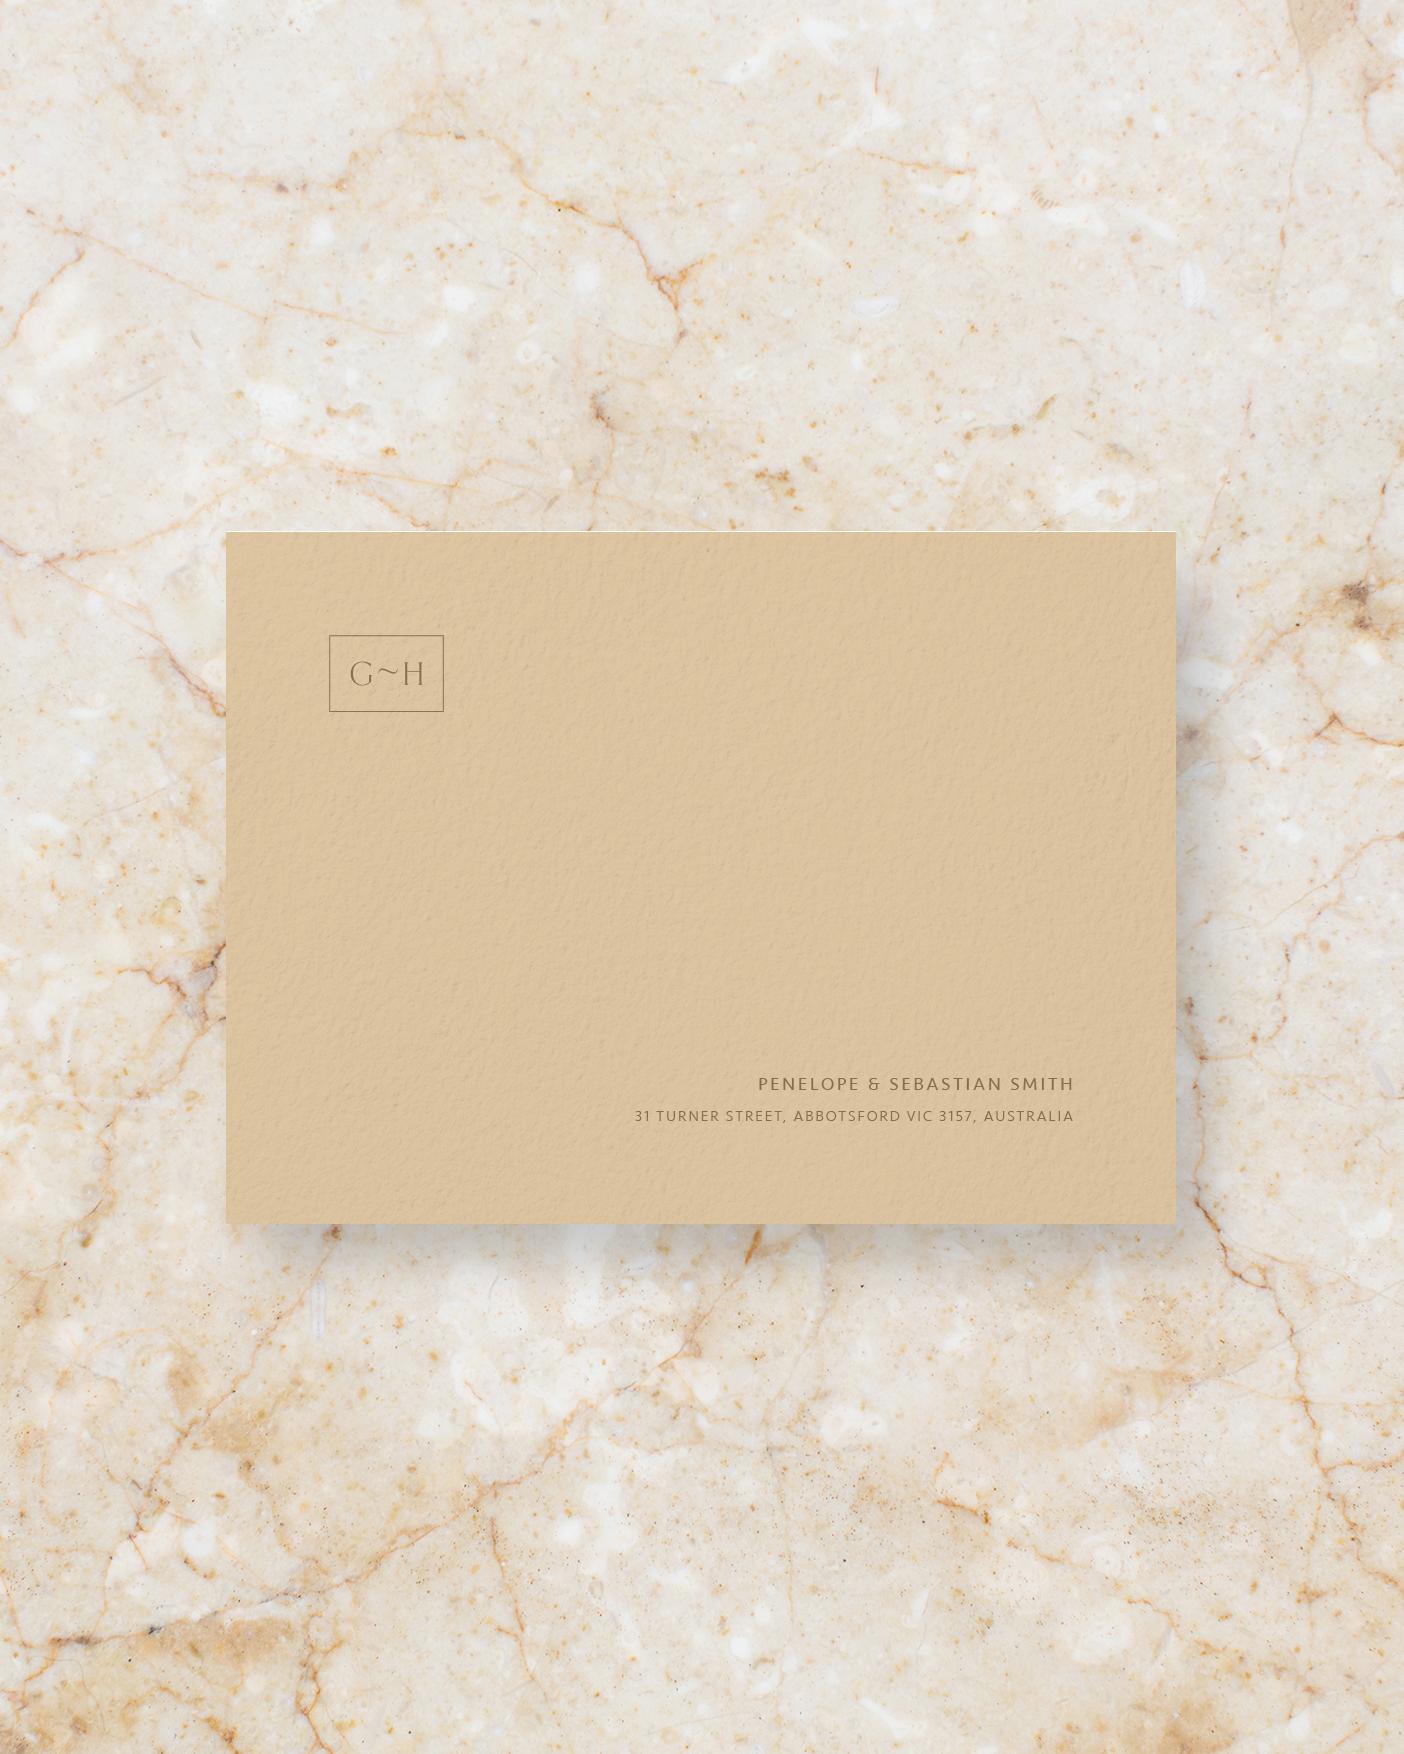 Envelope front - Stone